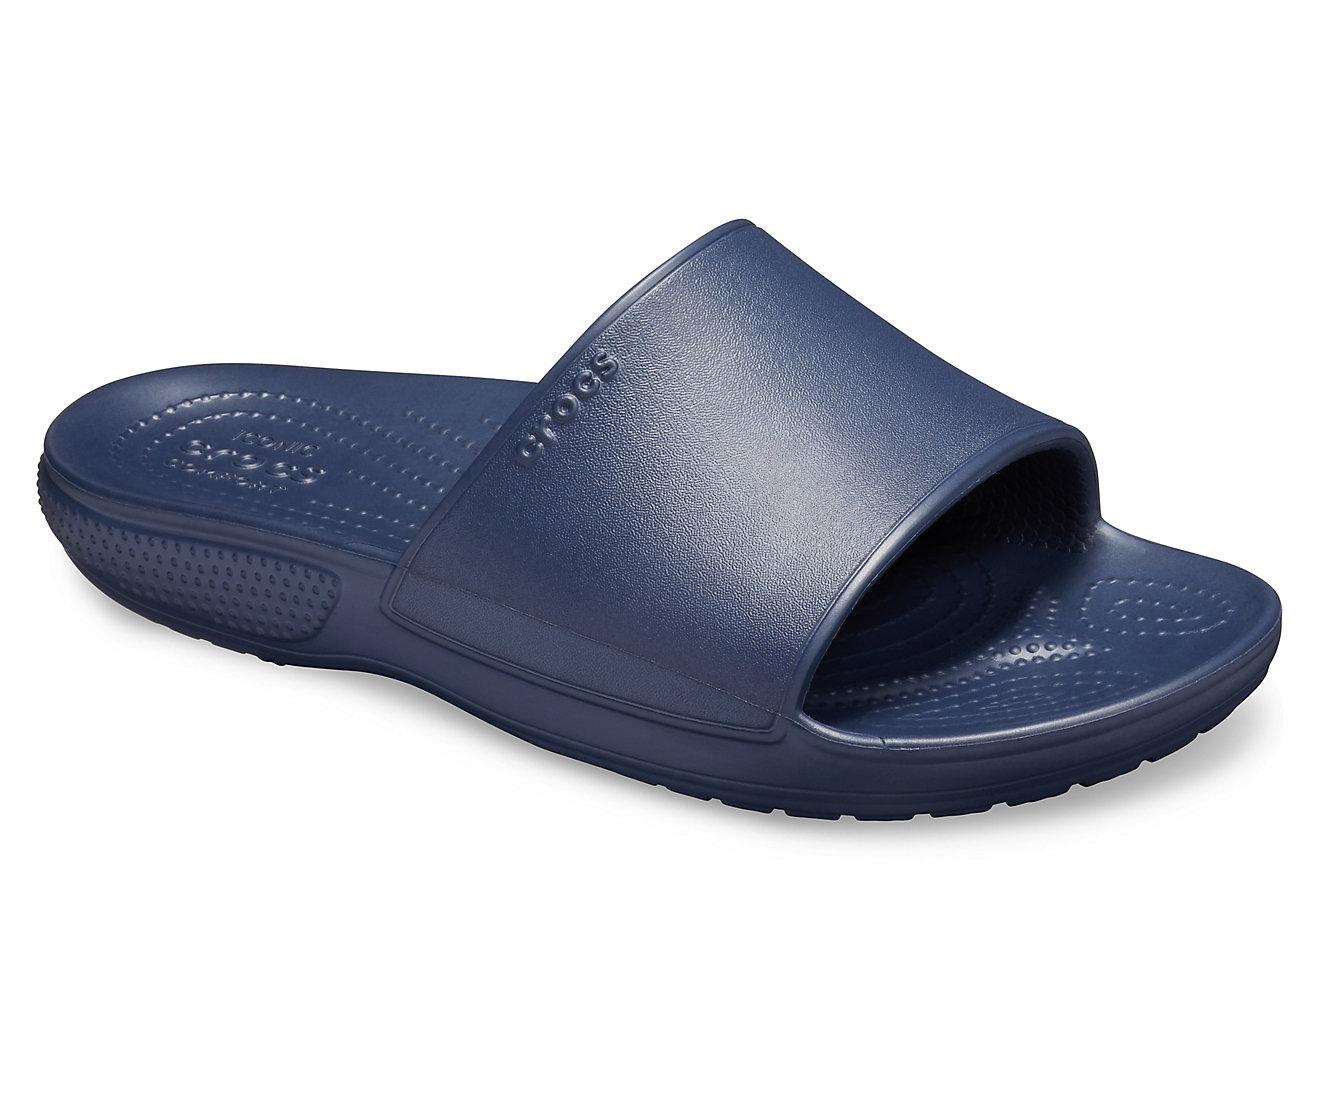 CROCS Classic II Slide 205732-410 NAVY Μπλε σκούρο